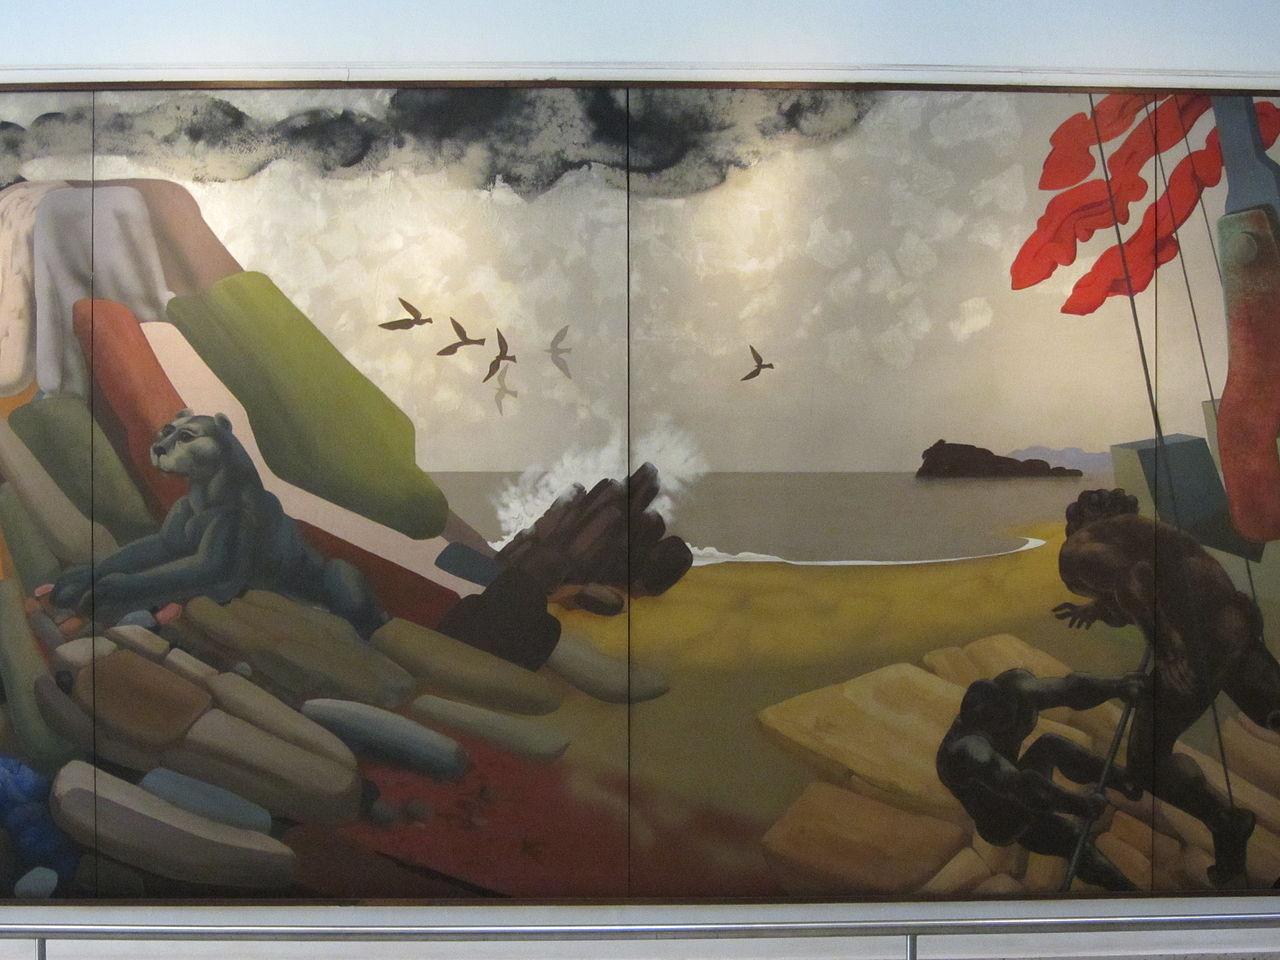 Archivo venturelli jose chile mural 1972 gam frf 02 for Mural metro u de chile